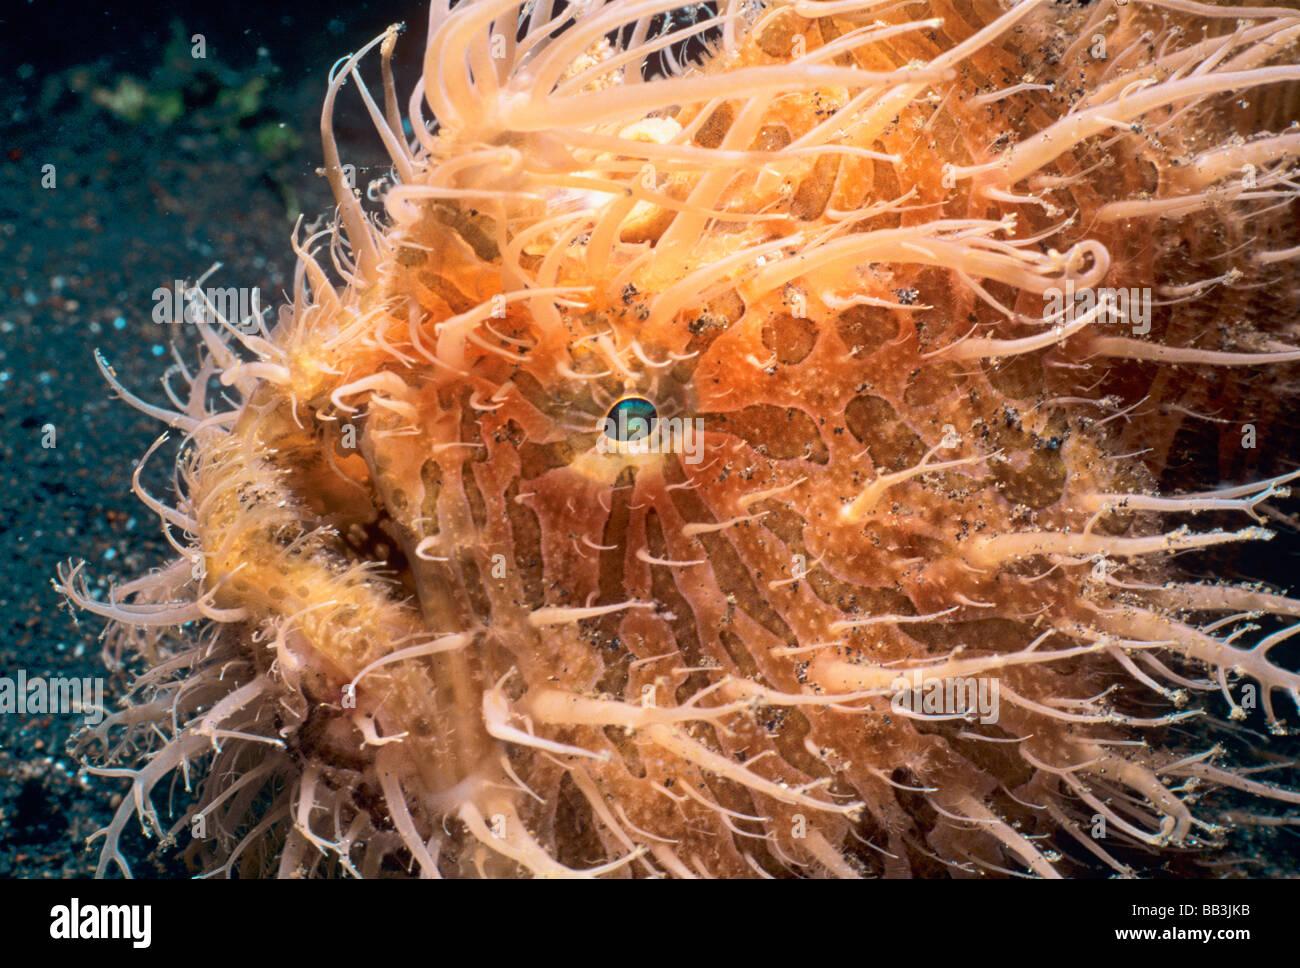 Hairy Rana pescatrice Rana pescatrice Antennarius hispidus Lembeh strait Celebes mare di Sulawesi - Indonesia Immagini Stock